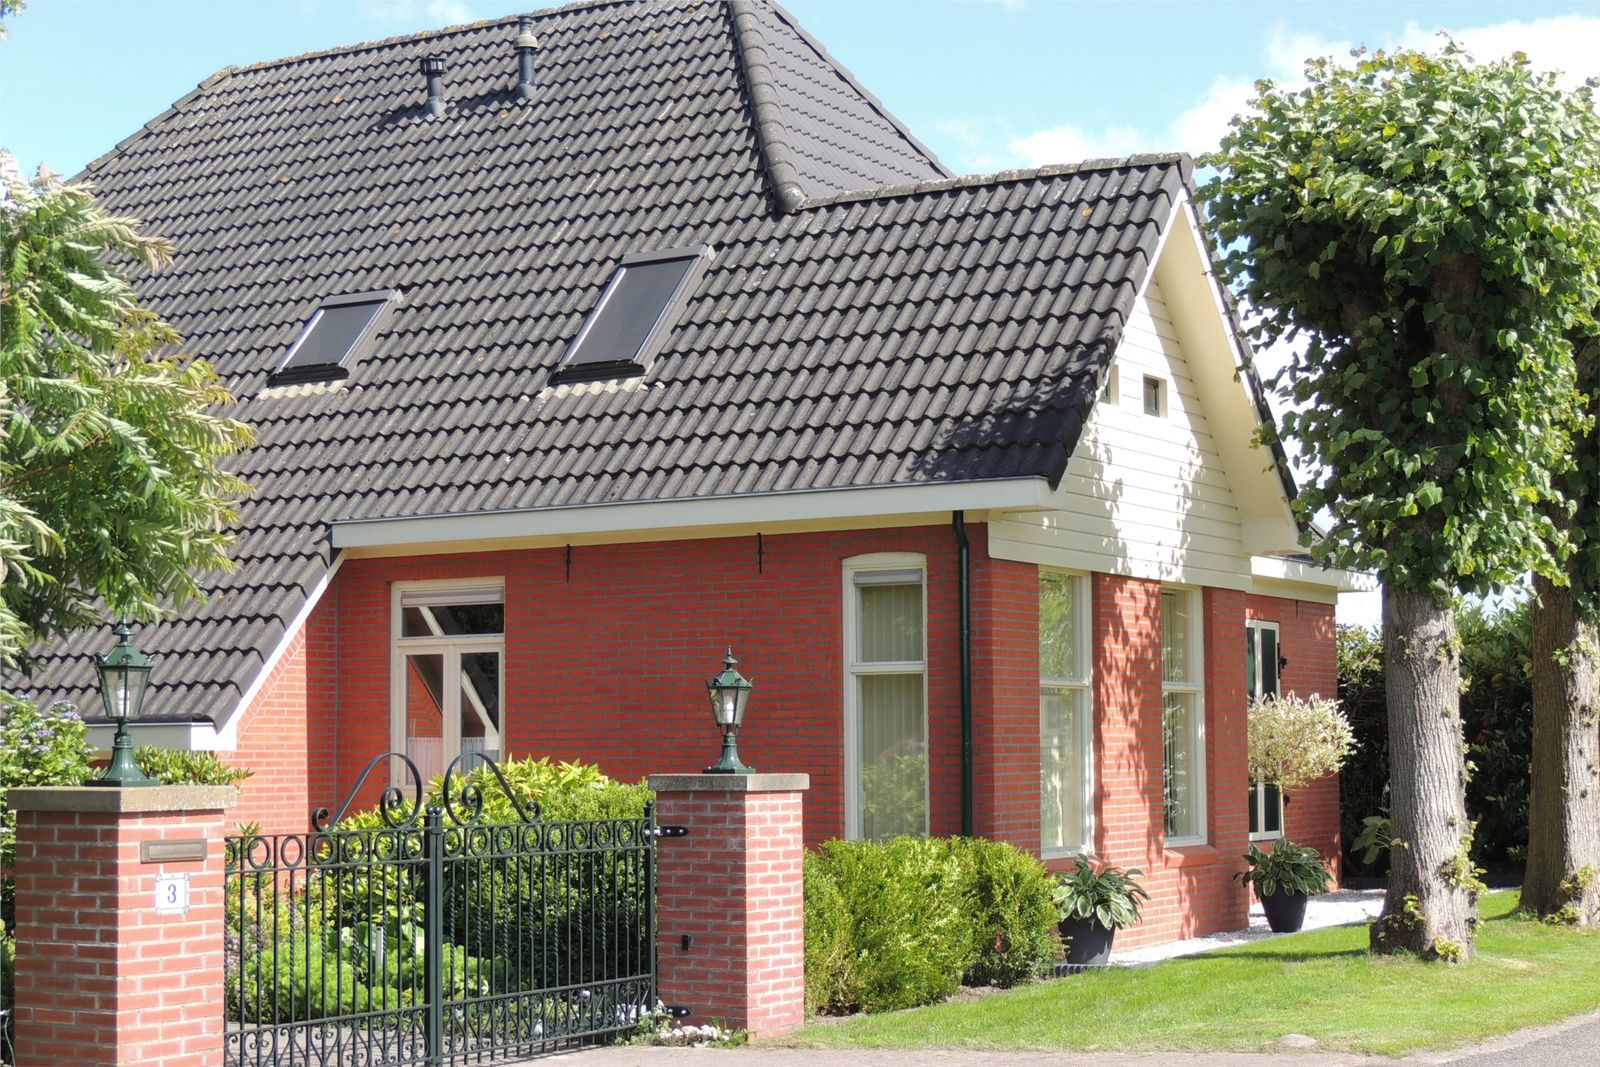 Willemstad 3, Appelscha